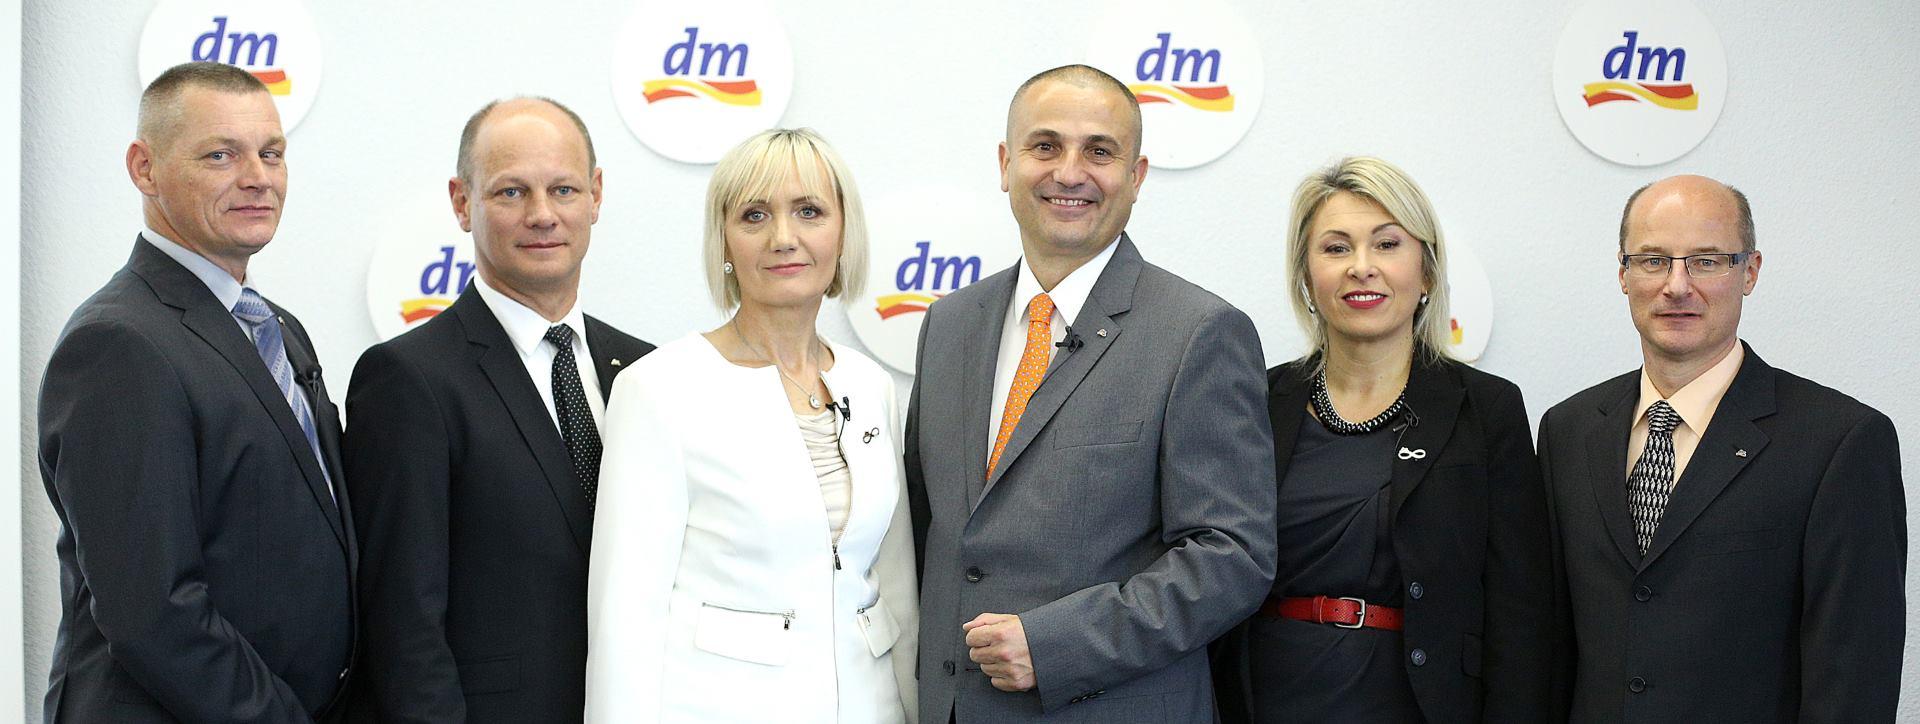 FOTO: dm predstavio odlične poslovne rezultate